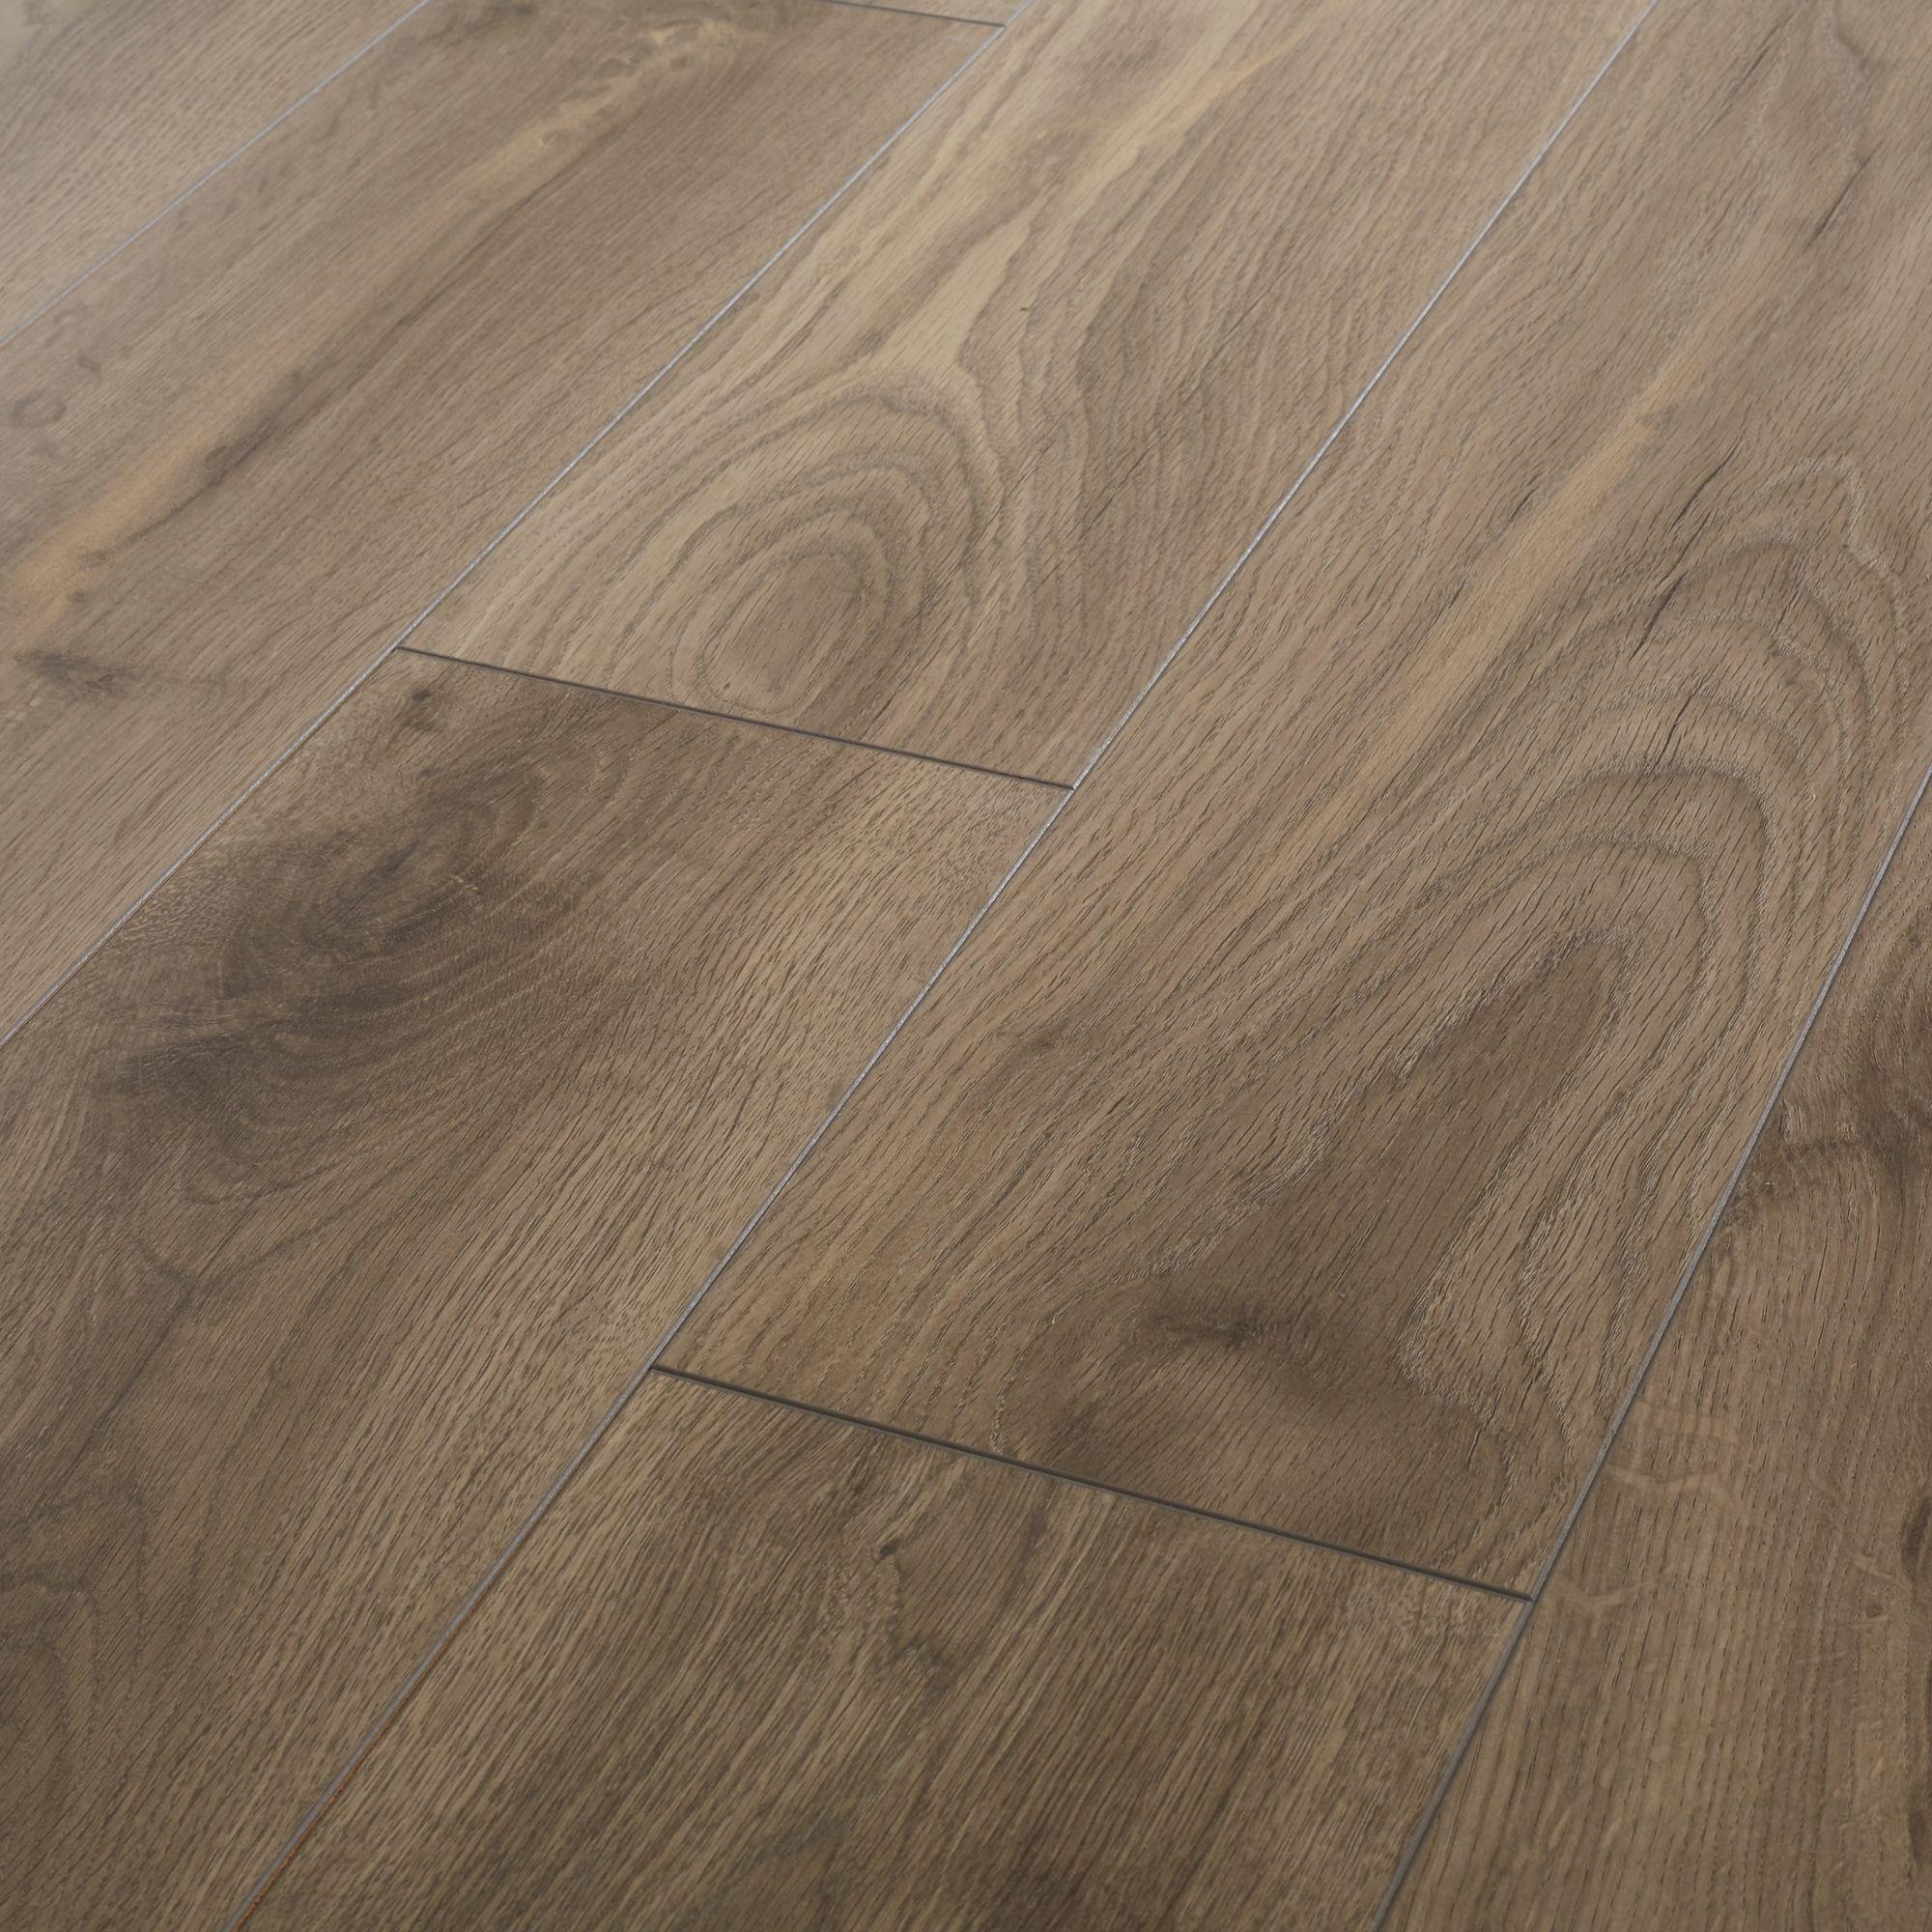 B Q Kitchen Flooring Laminate, Kitchen Laminate Flooring B Q